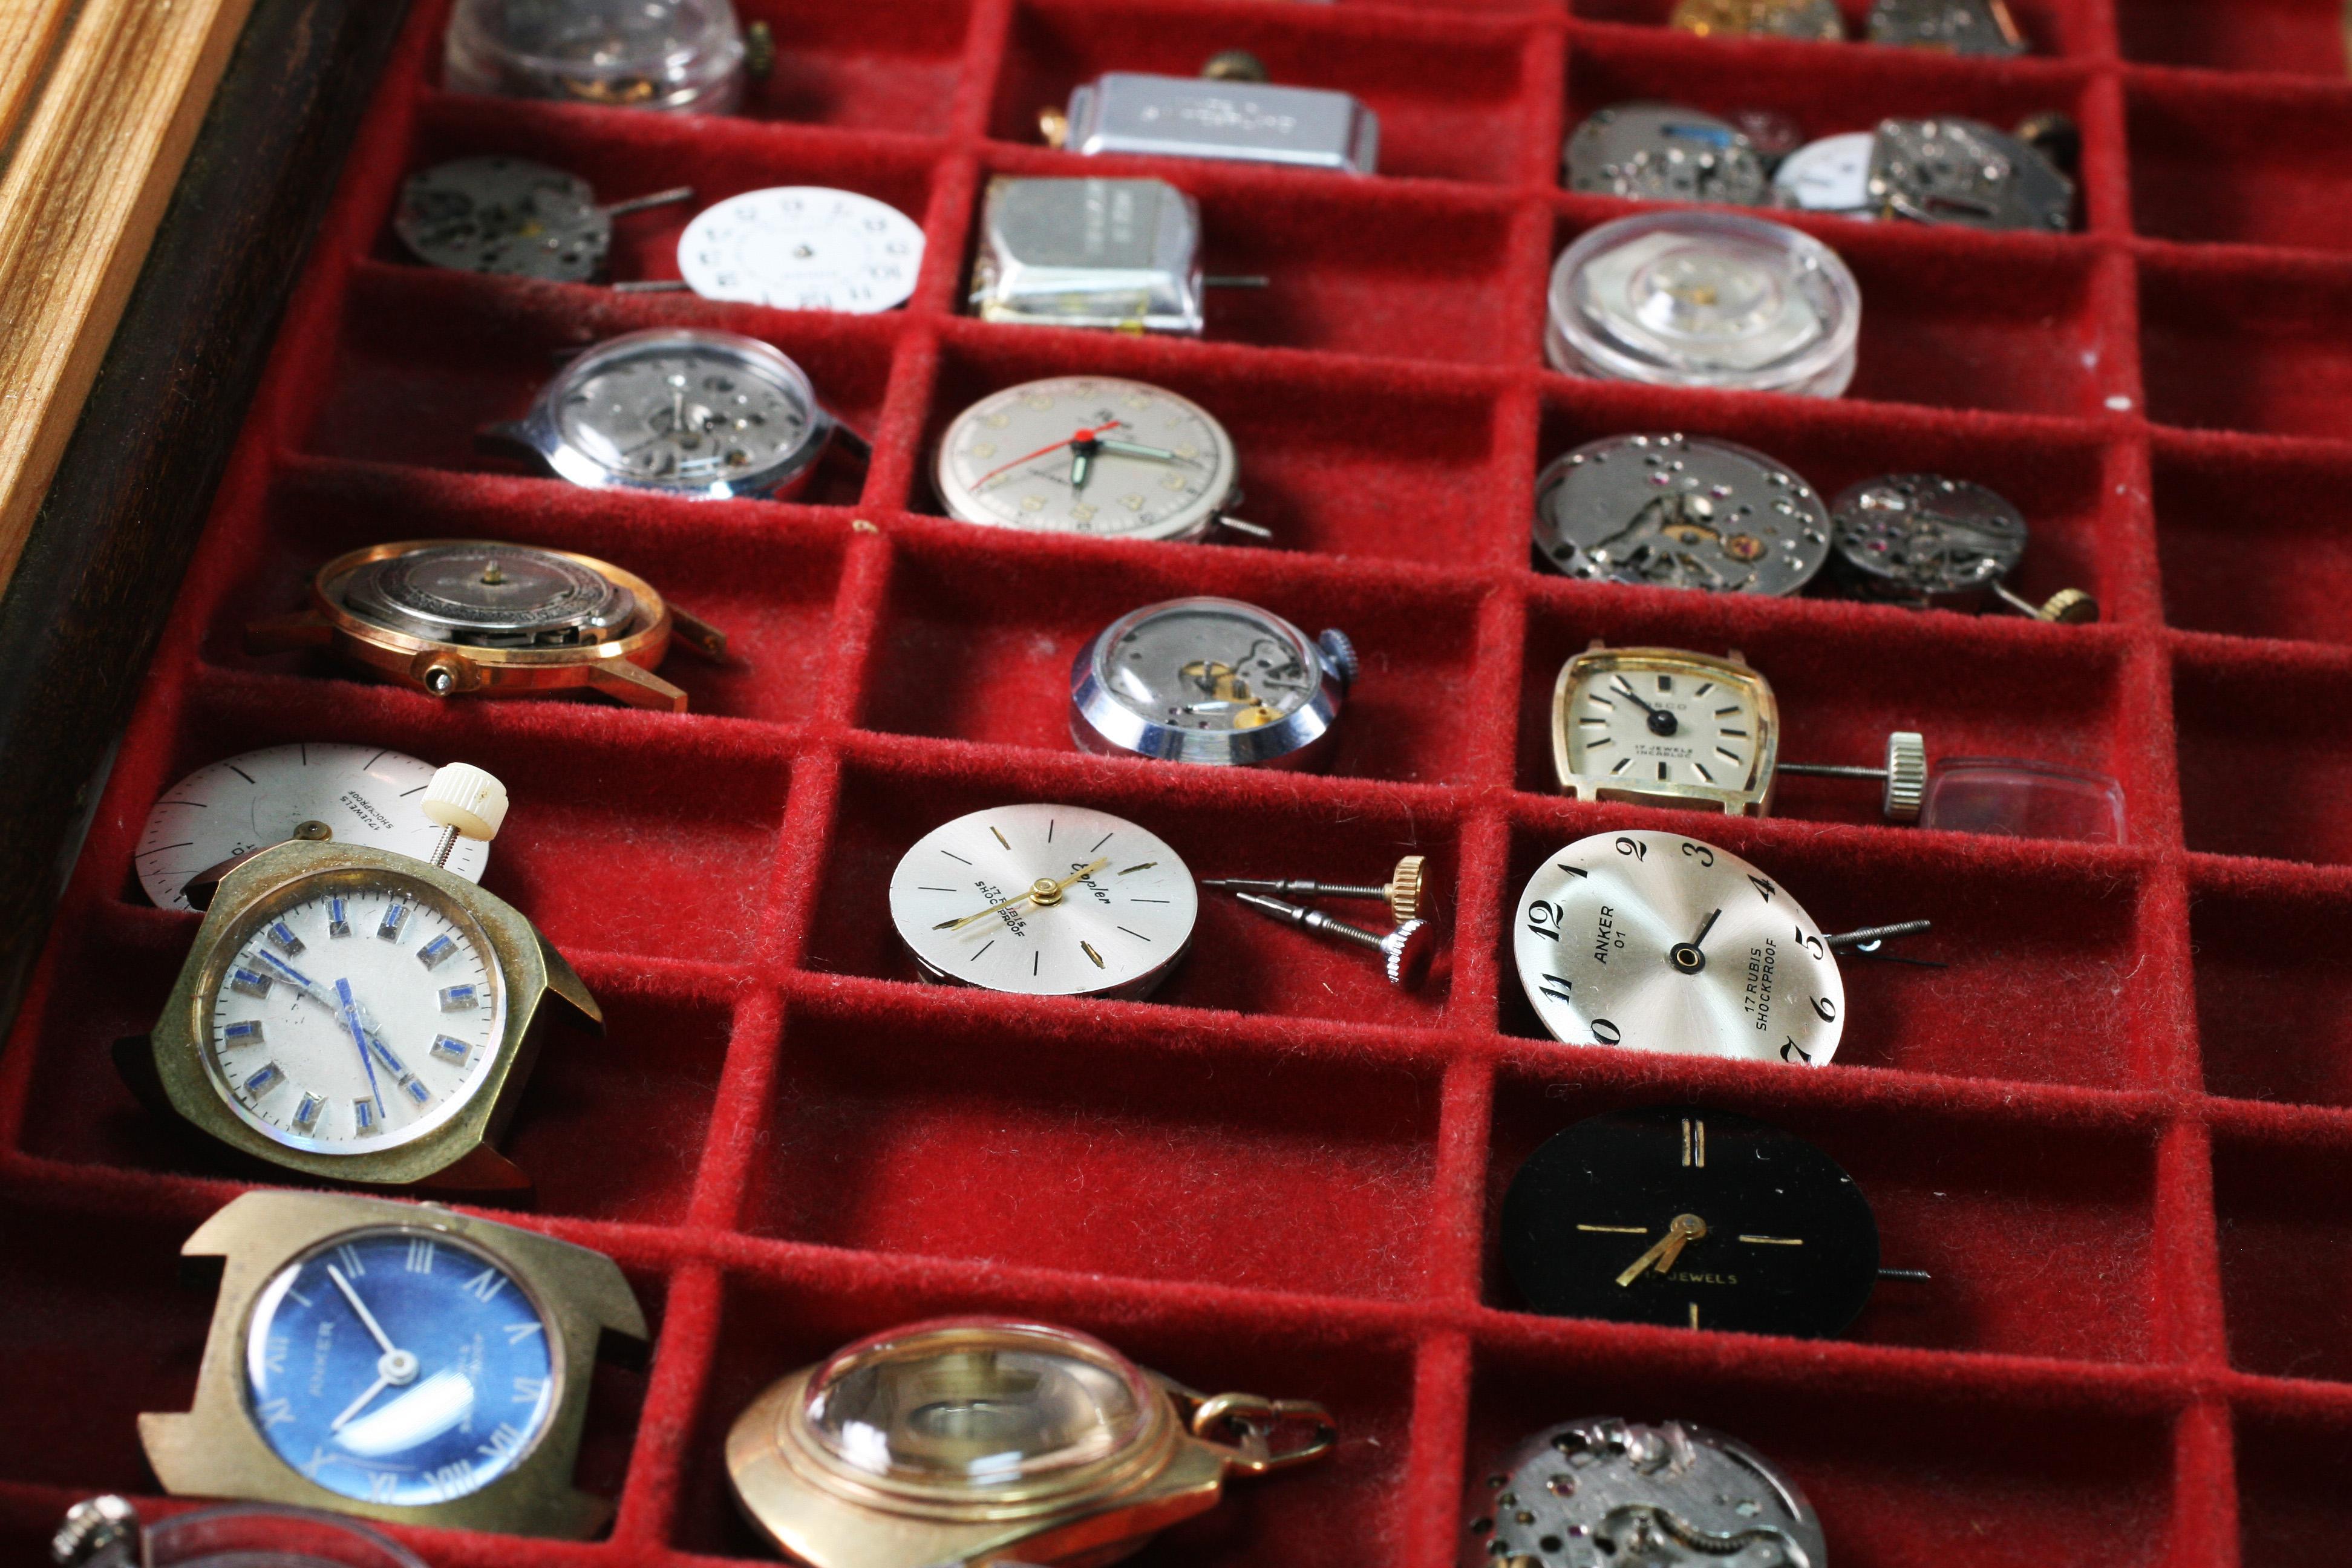 Vintage Ickler watches